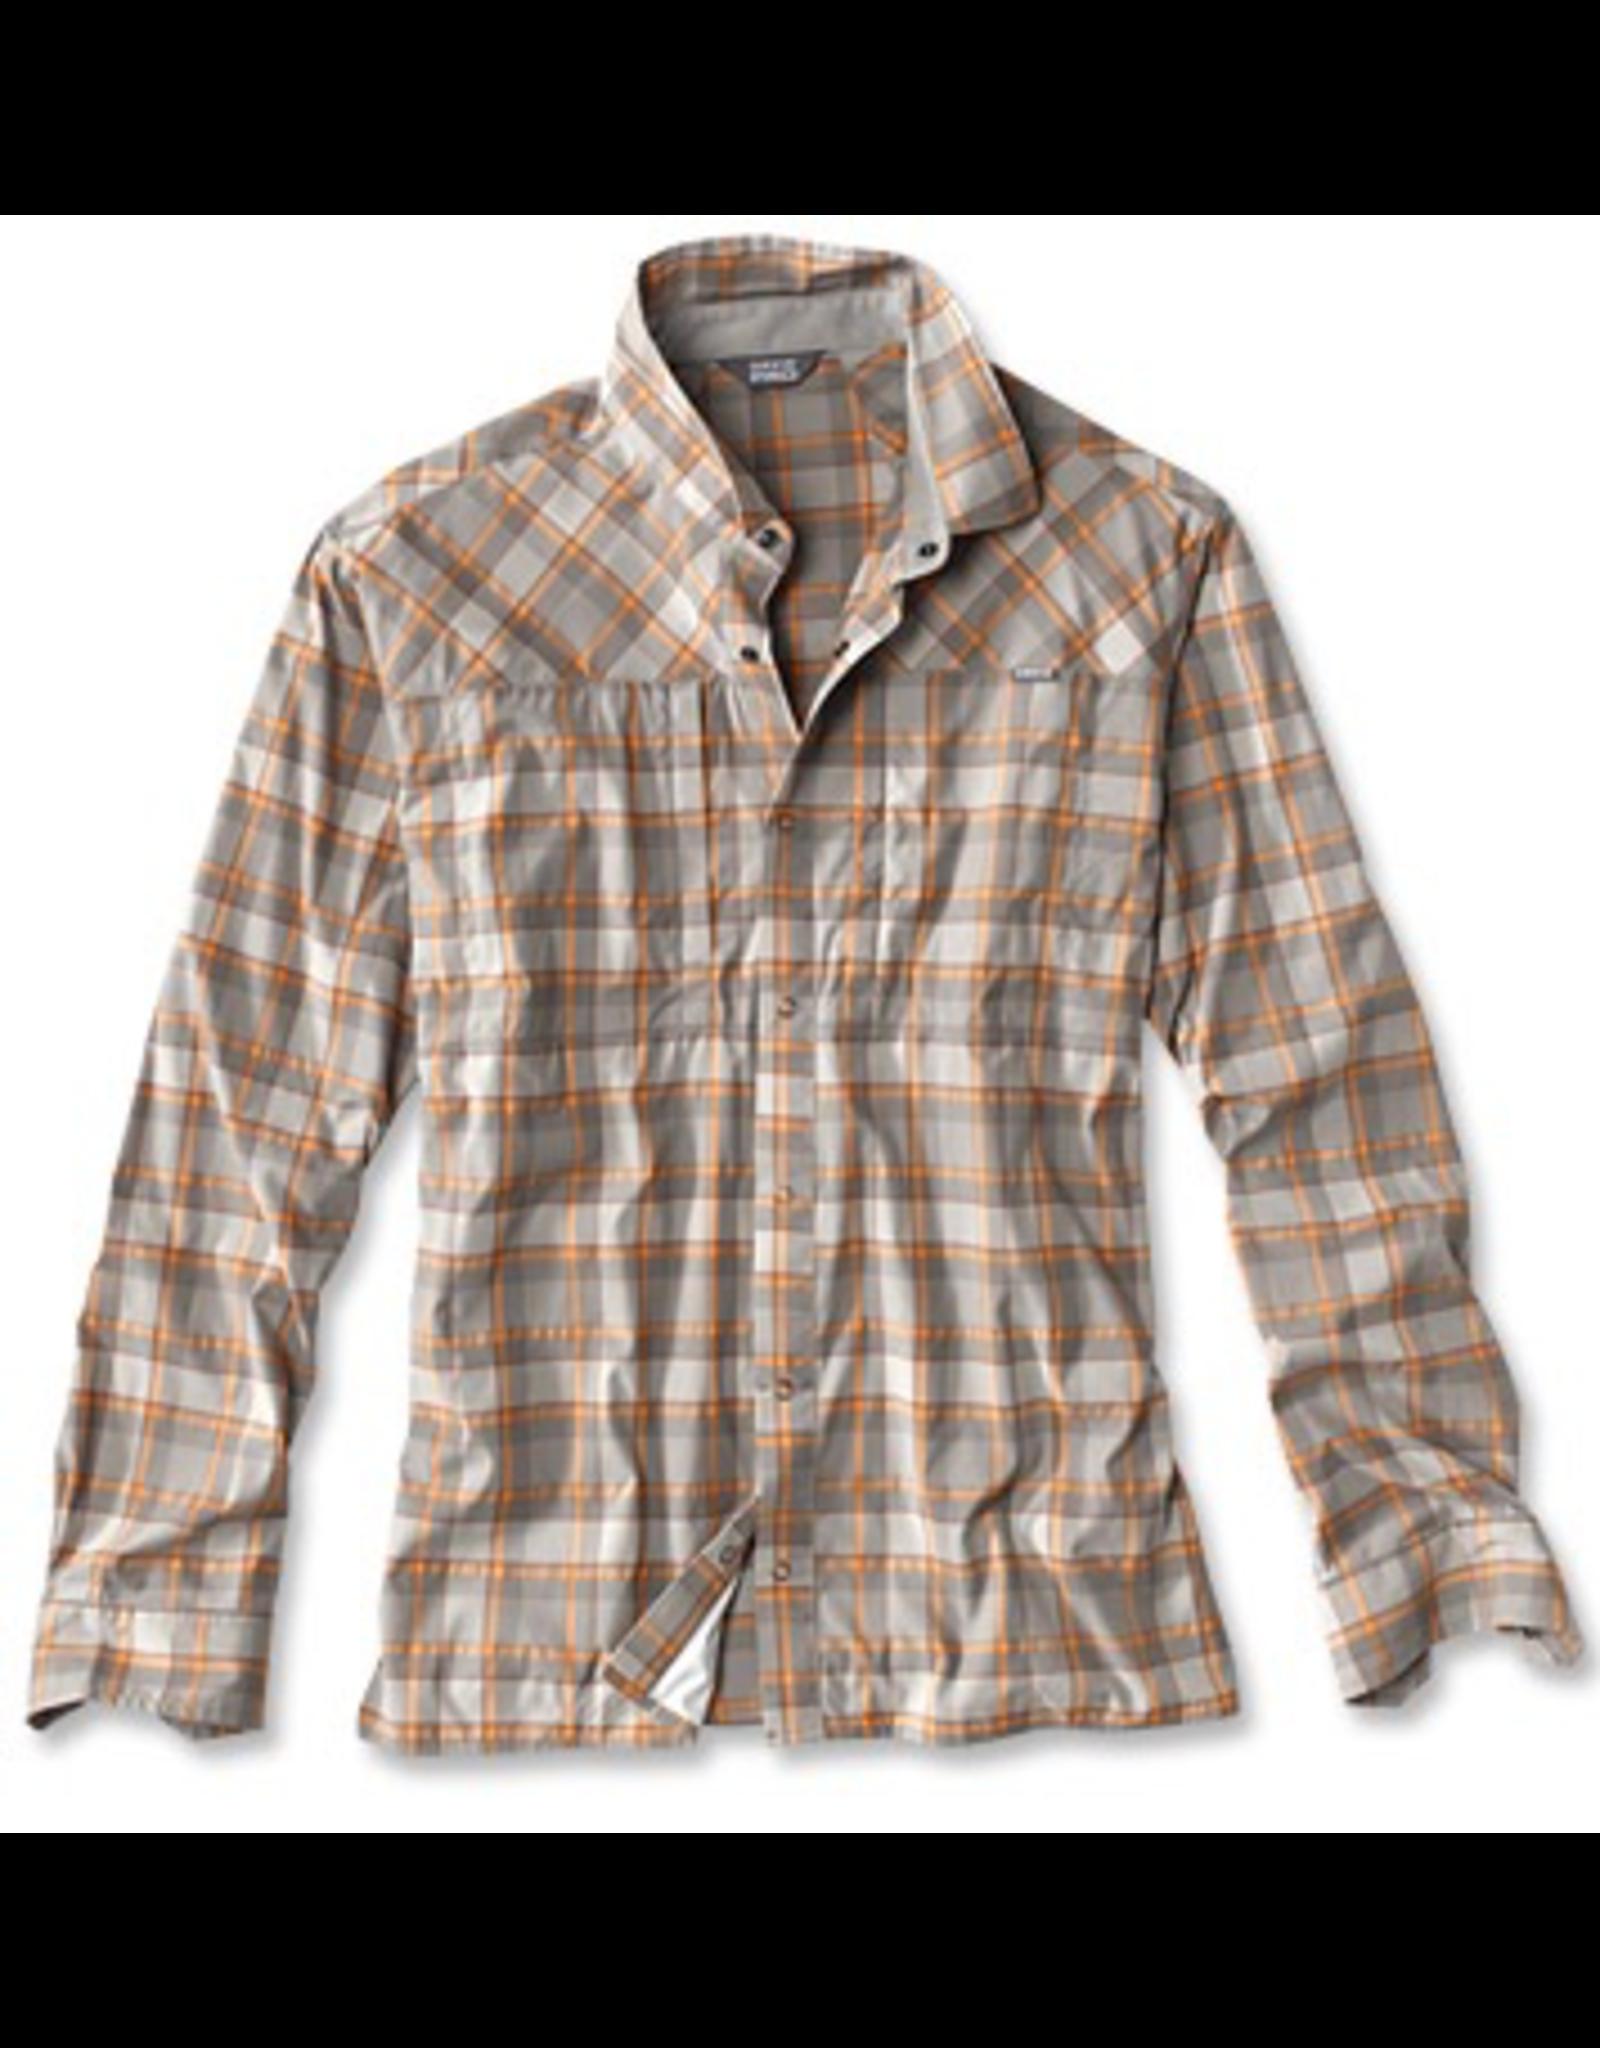 Orvis Orvis Pro Stretch LS Shirt